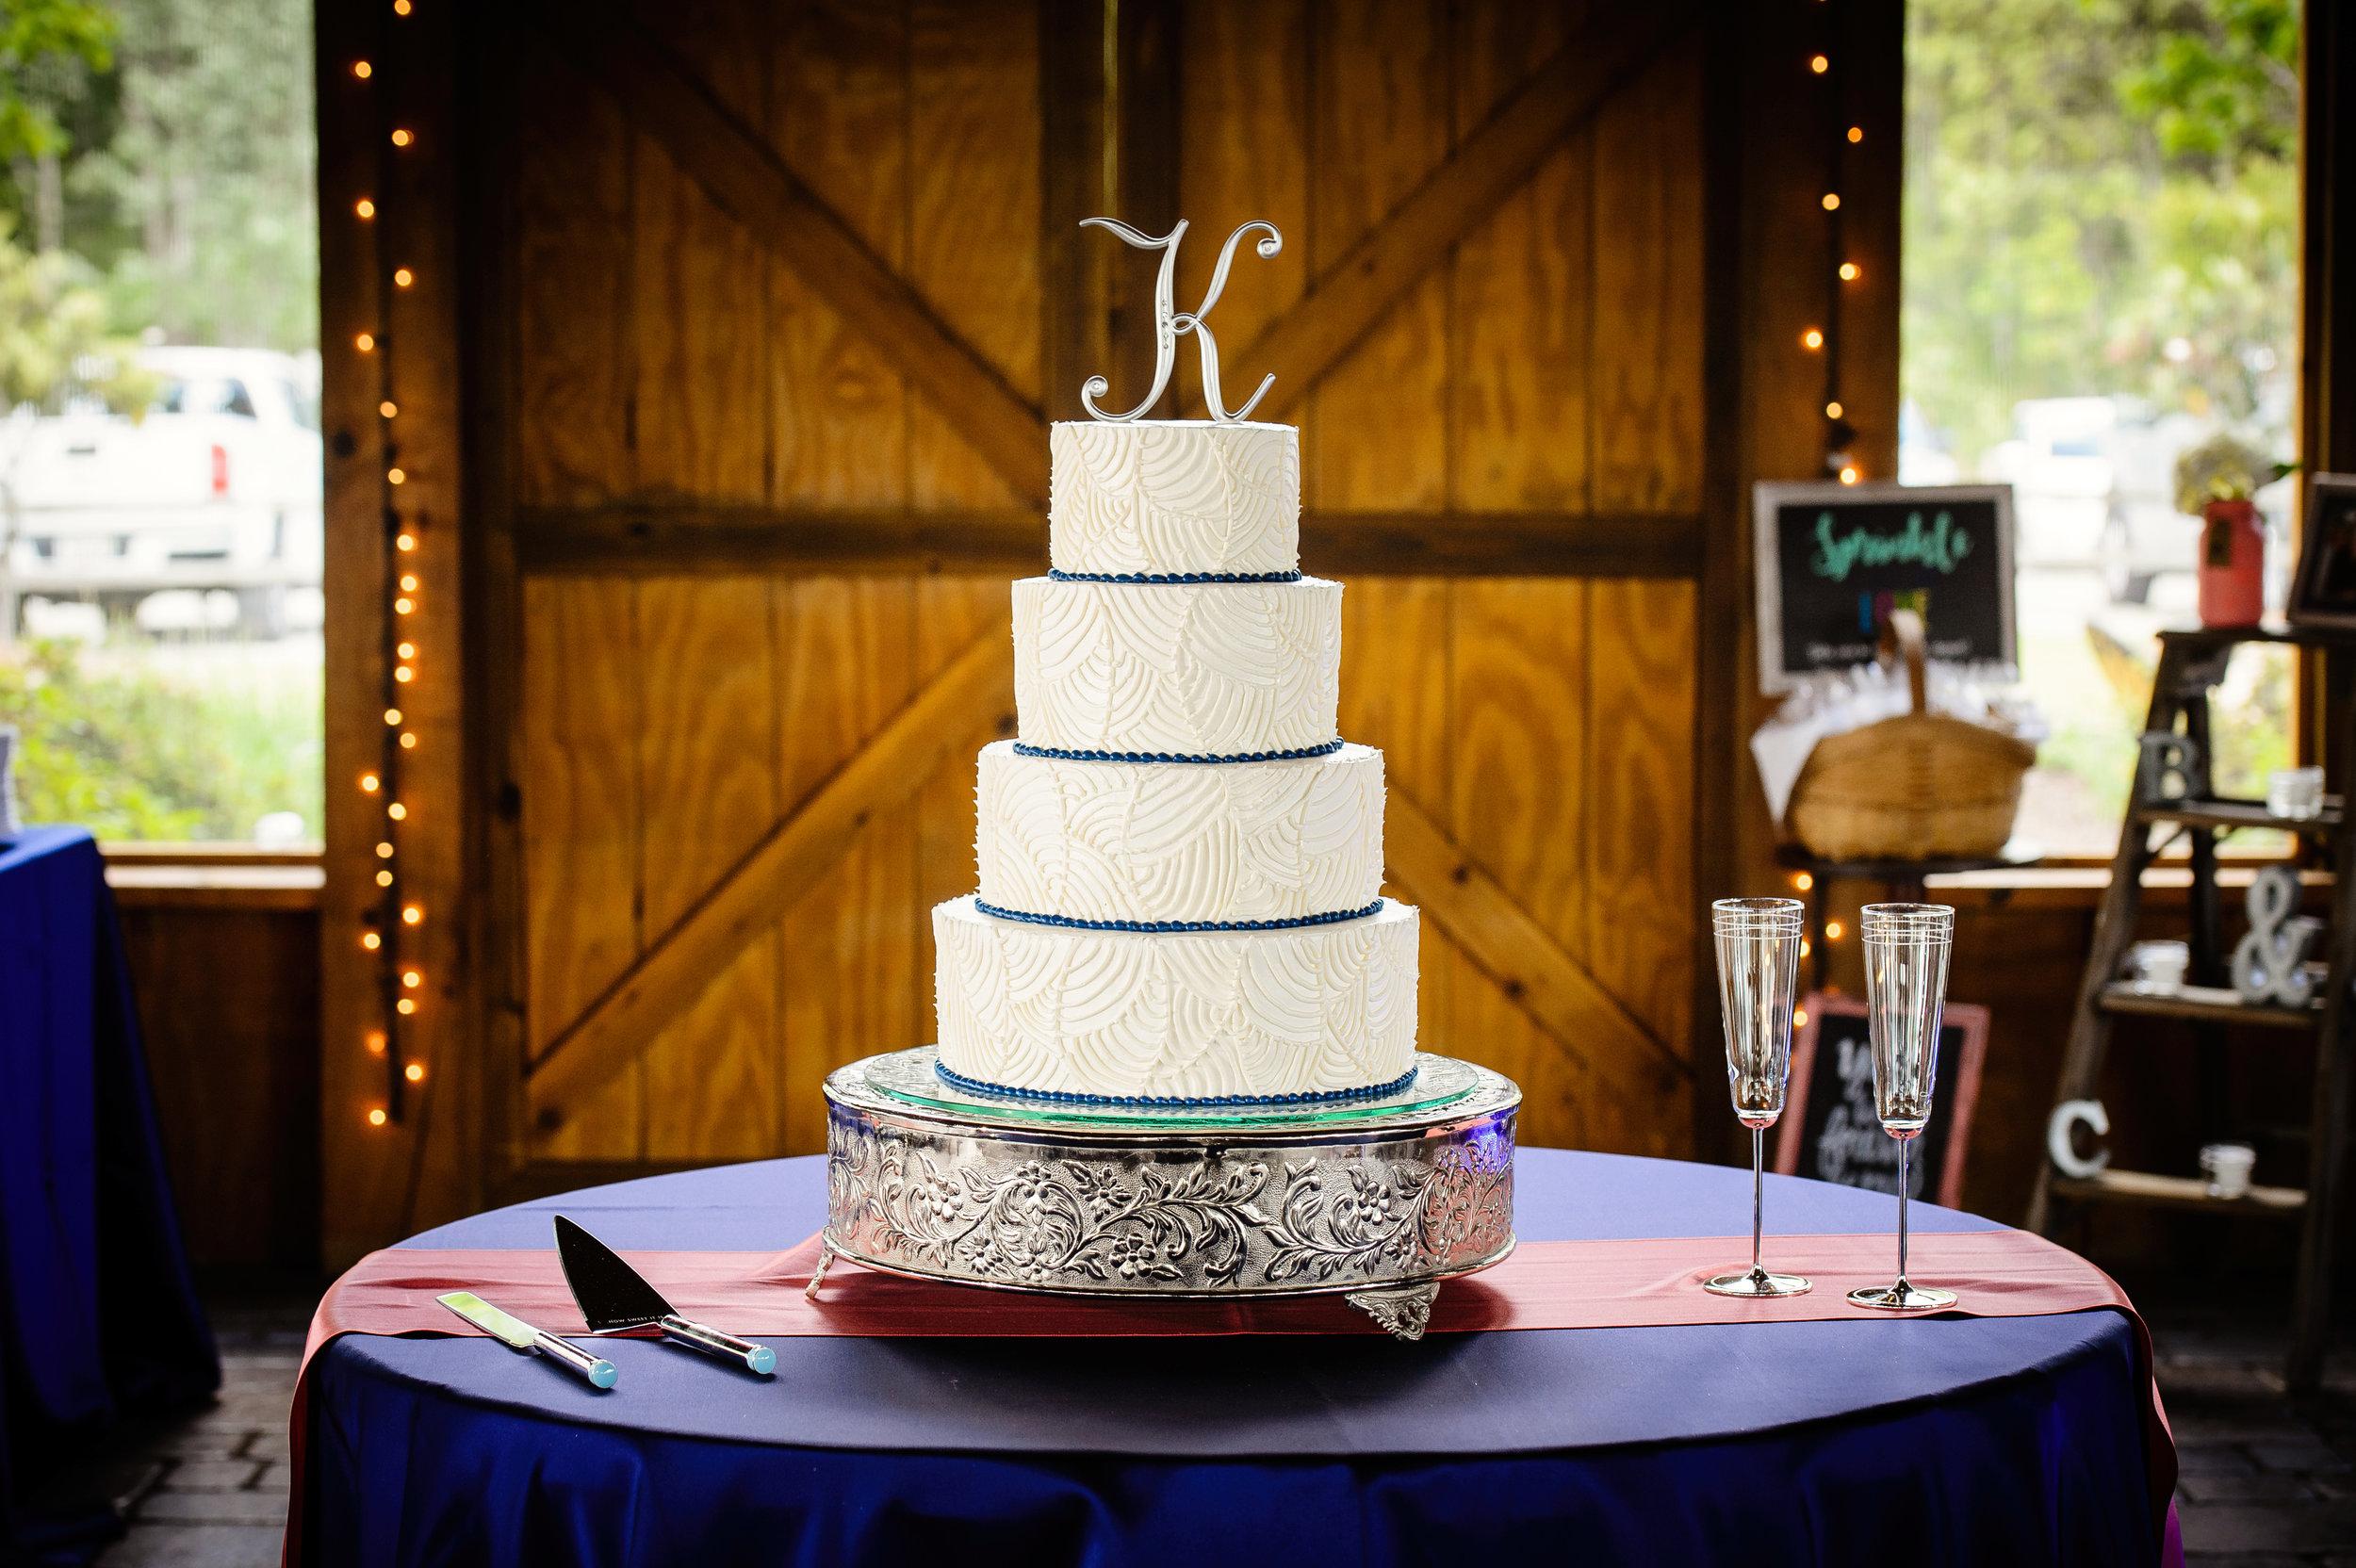 Cake_Photo_Newport_Mrs_Vingerbers_Sweets